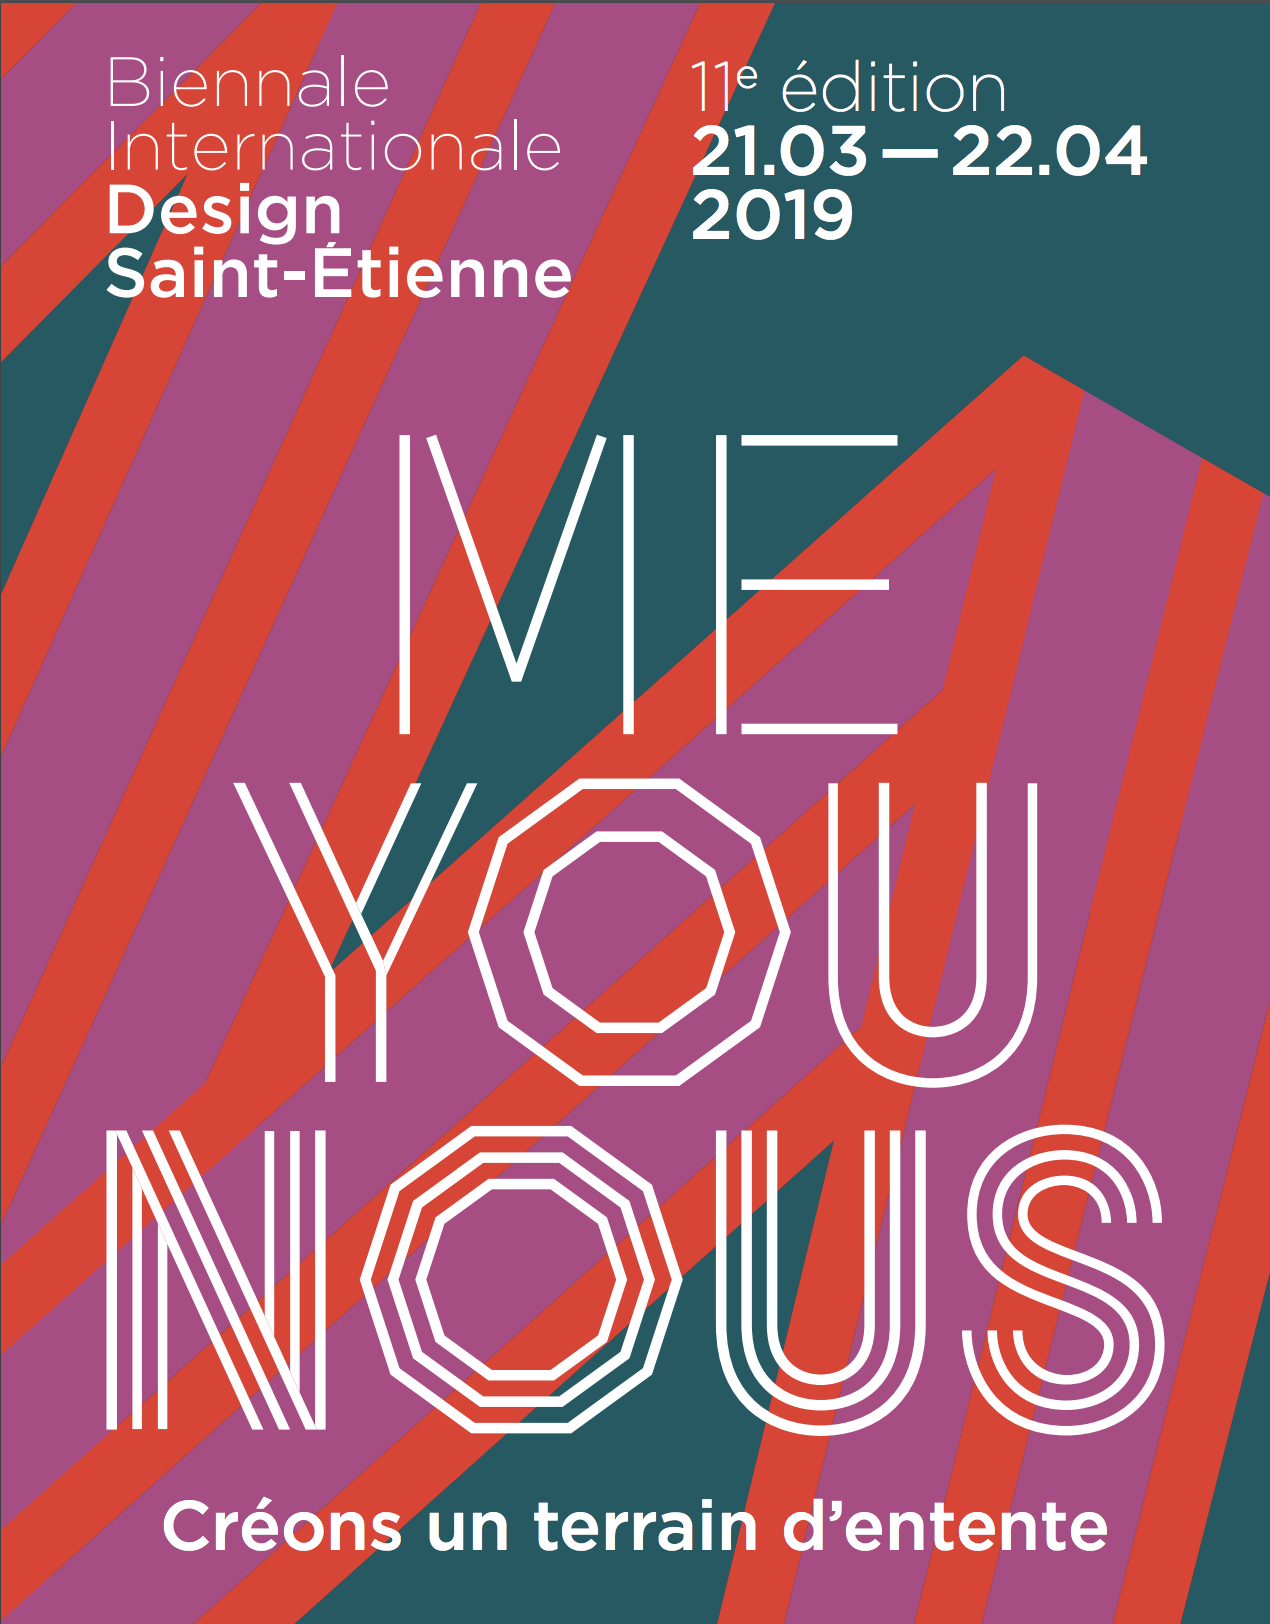 biennale-internationale-design-saint-etienne-2019